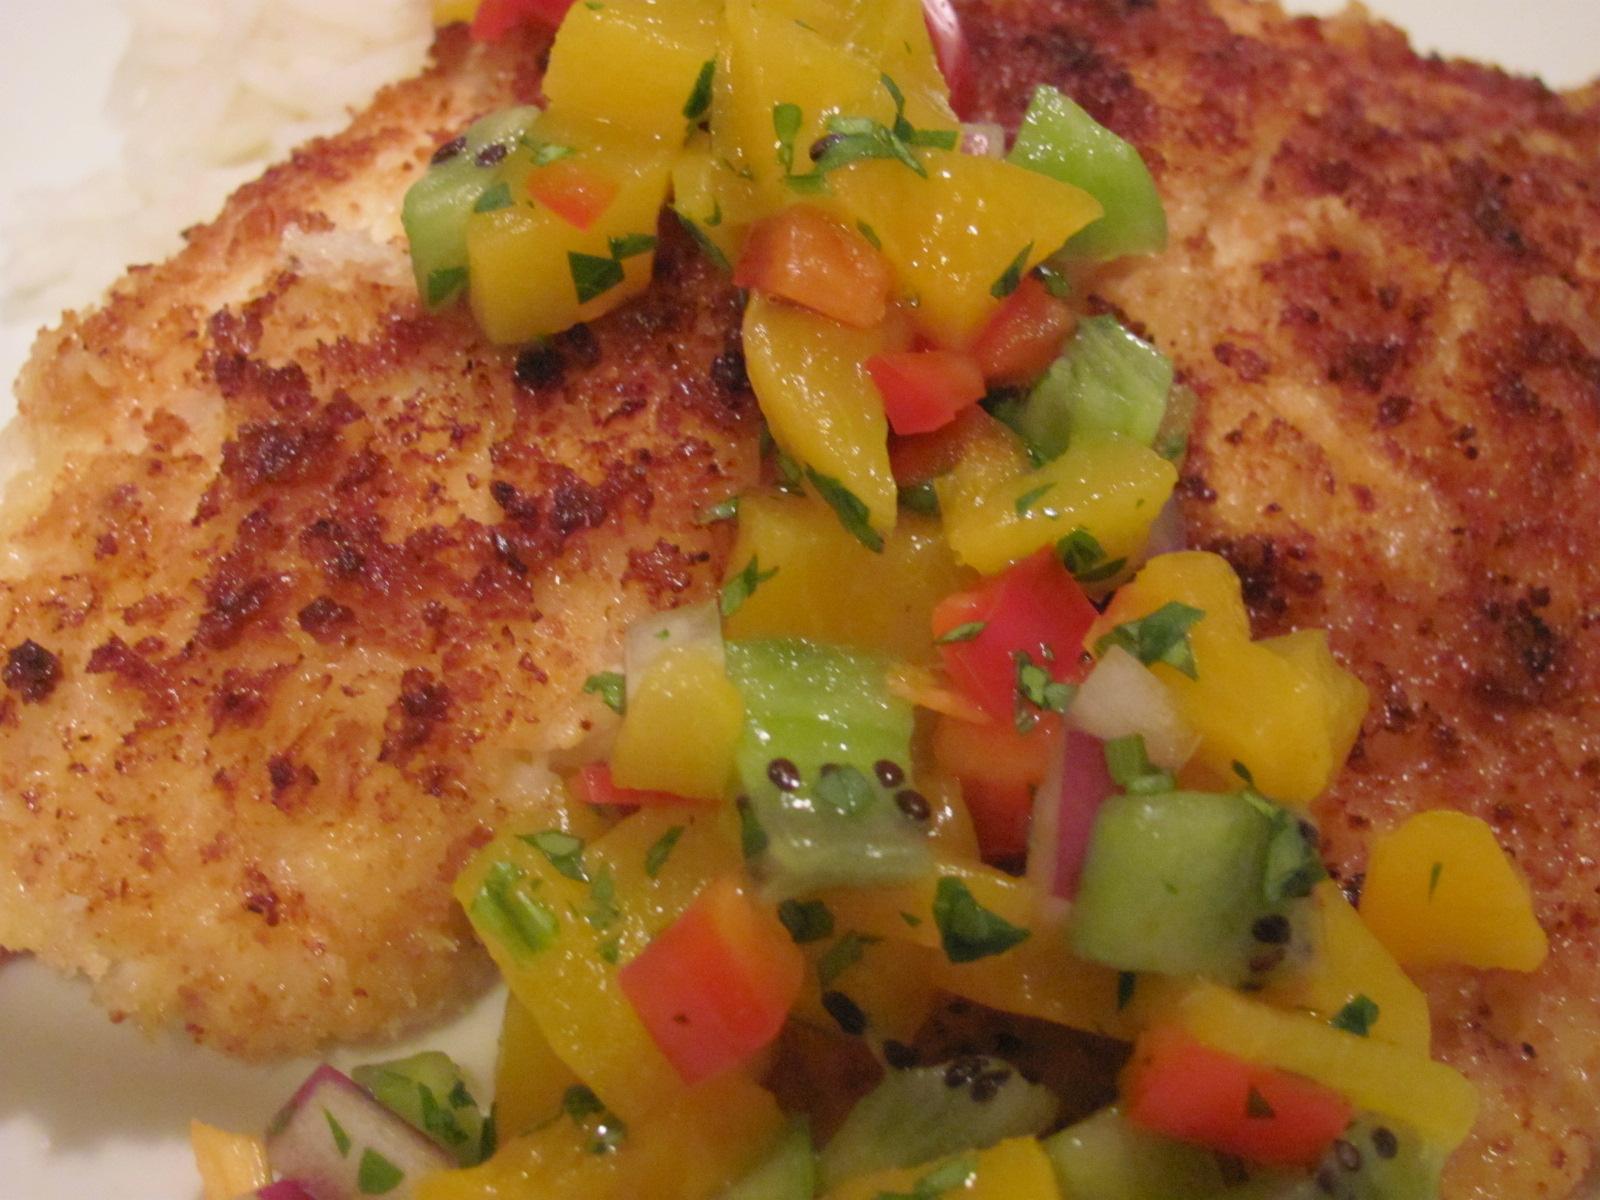 ... Recipes: Panko Crusted Tilapia with Peach Salsa over Basmati Rice